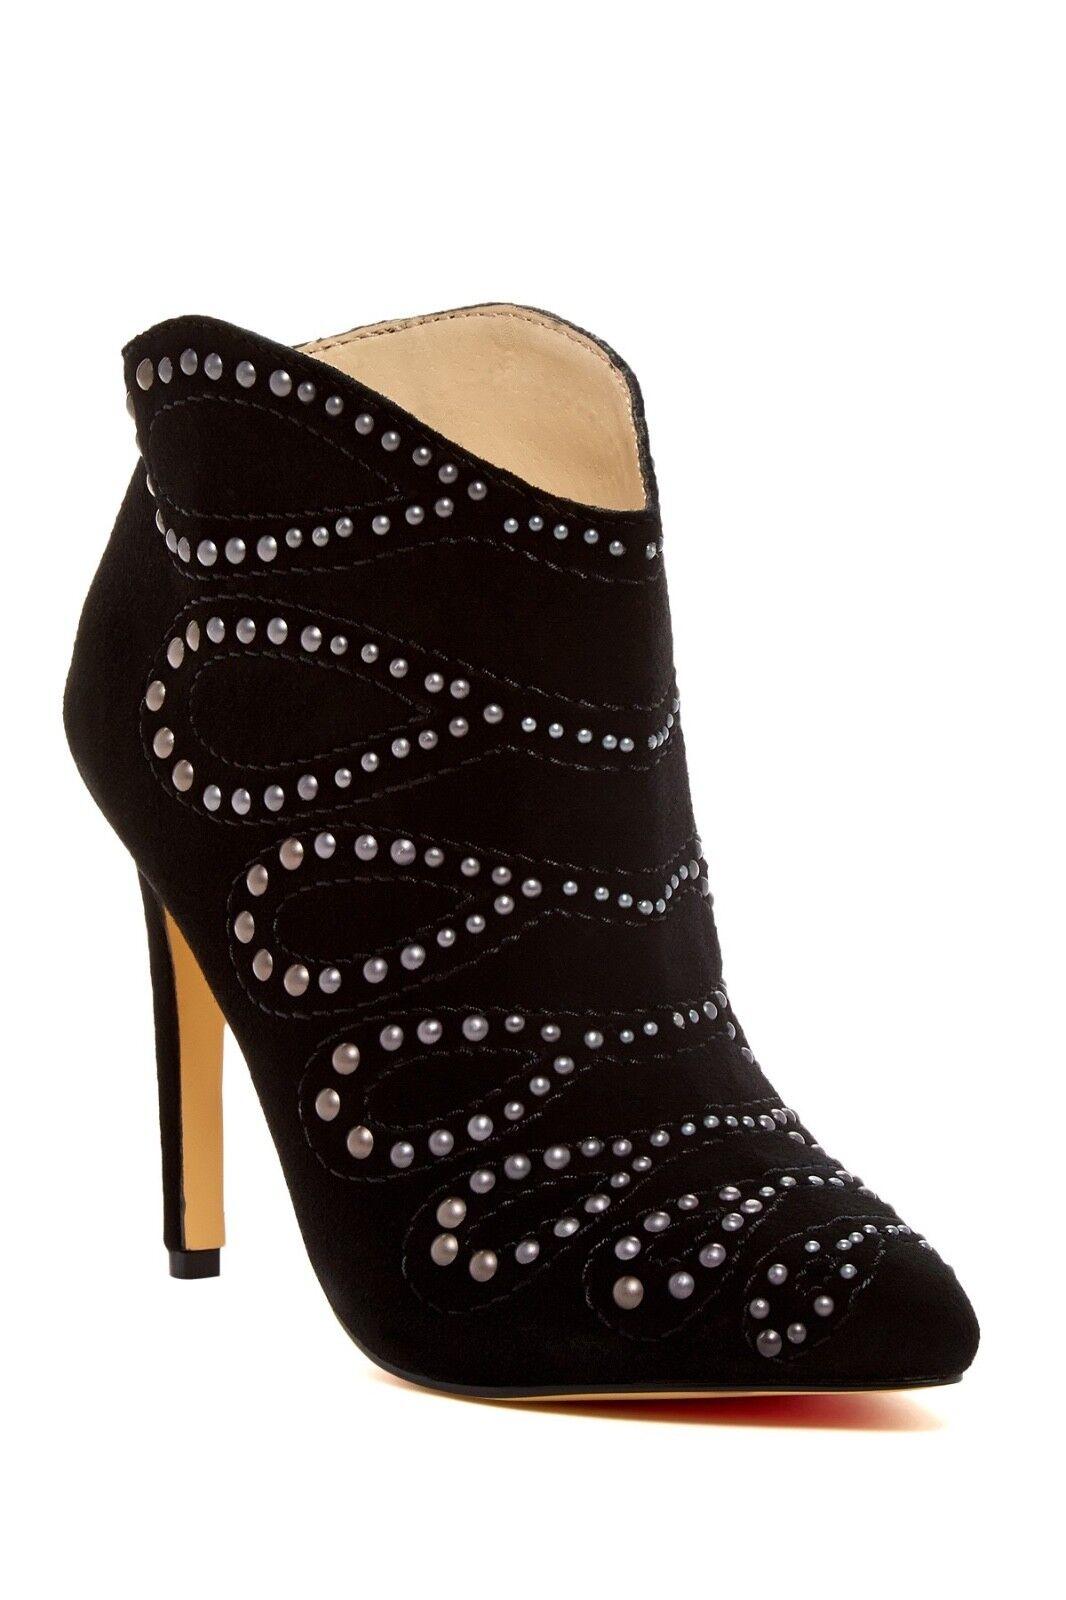 NIB Joe's Jeans Scout Studded Suede Stiletto Heeled Fashion Booties Black - Sz 8